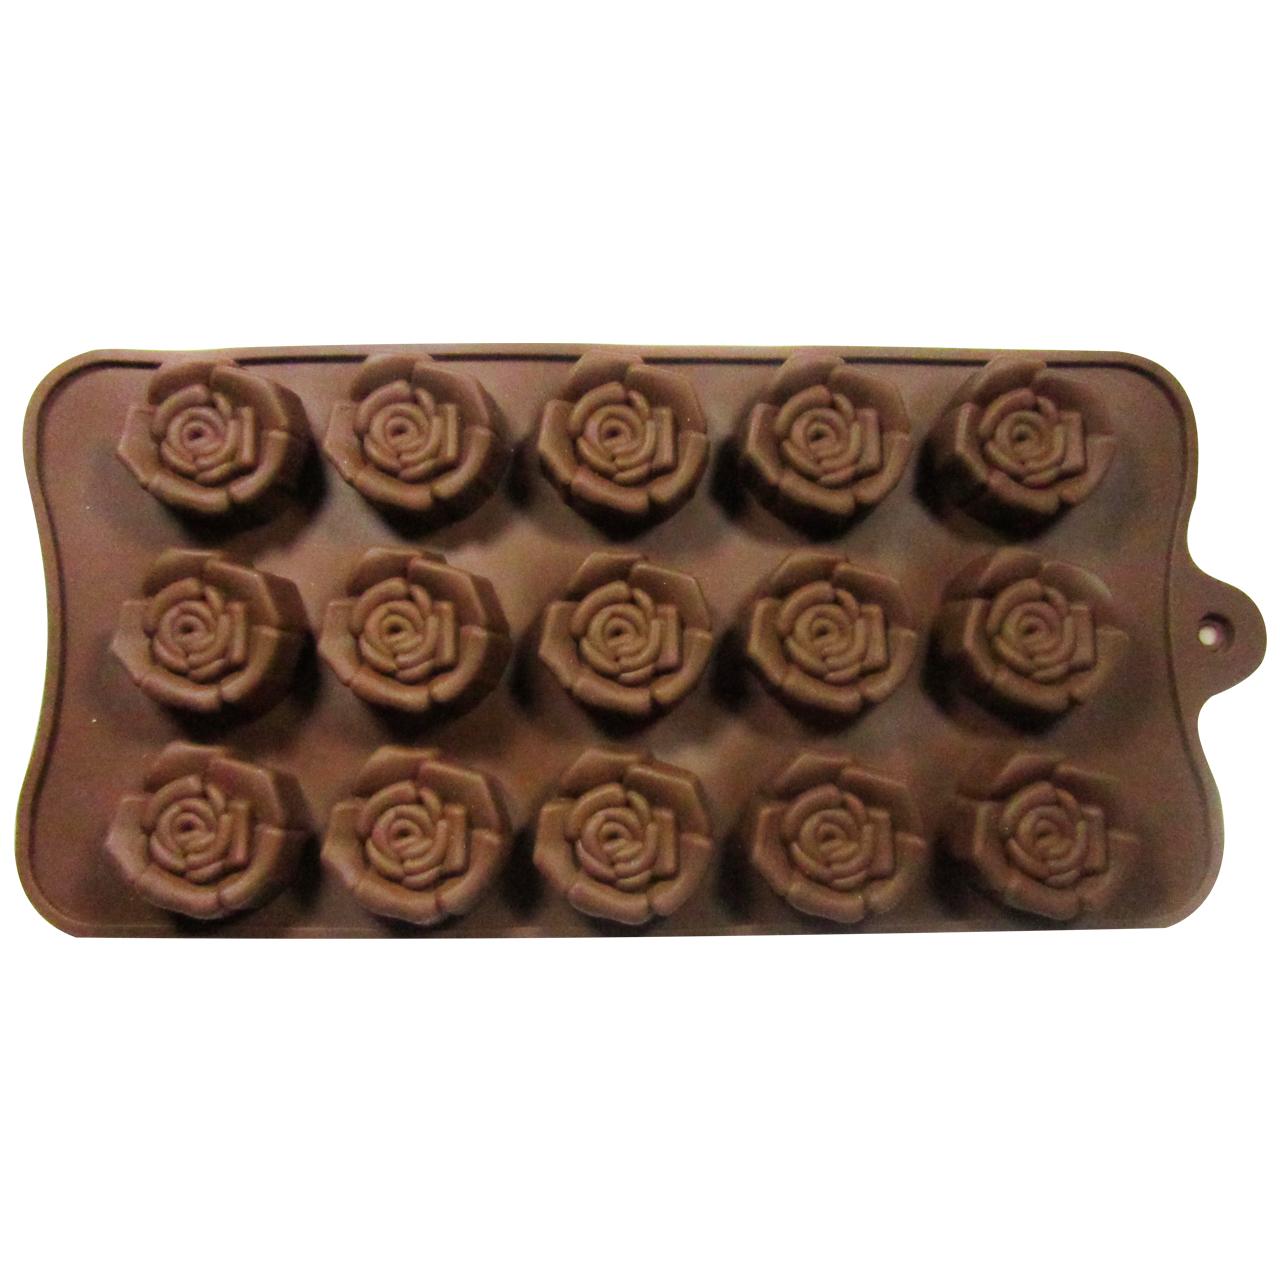 قالب شکلات مدل Flower